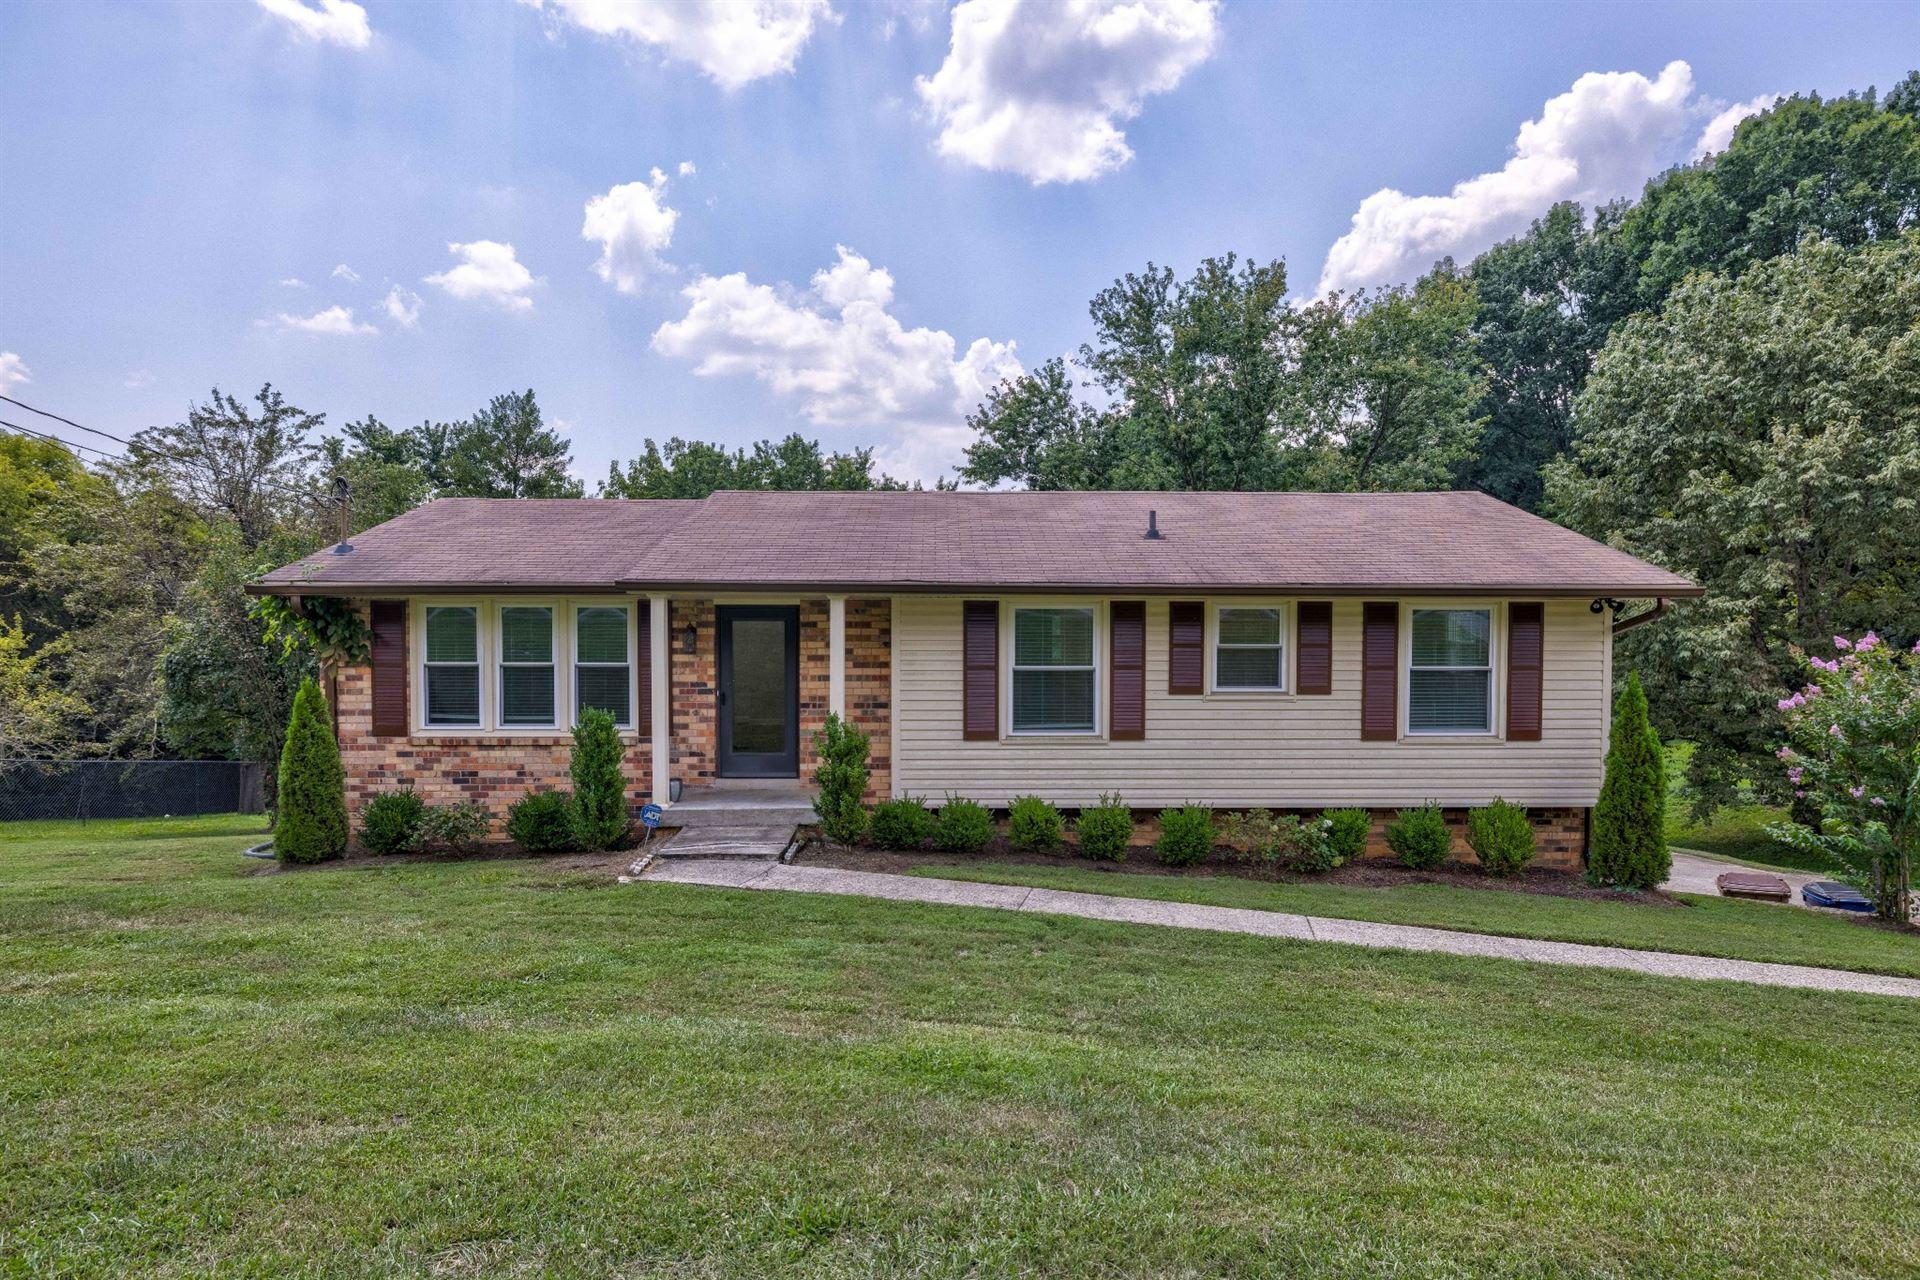 115 Connor Dr, Goodlettsville, TN 37072 - MLS#: 2285313